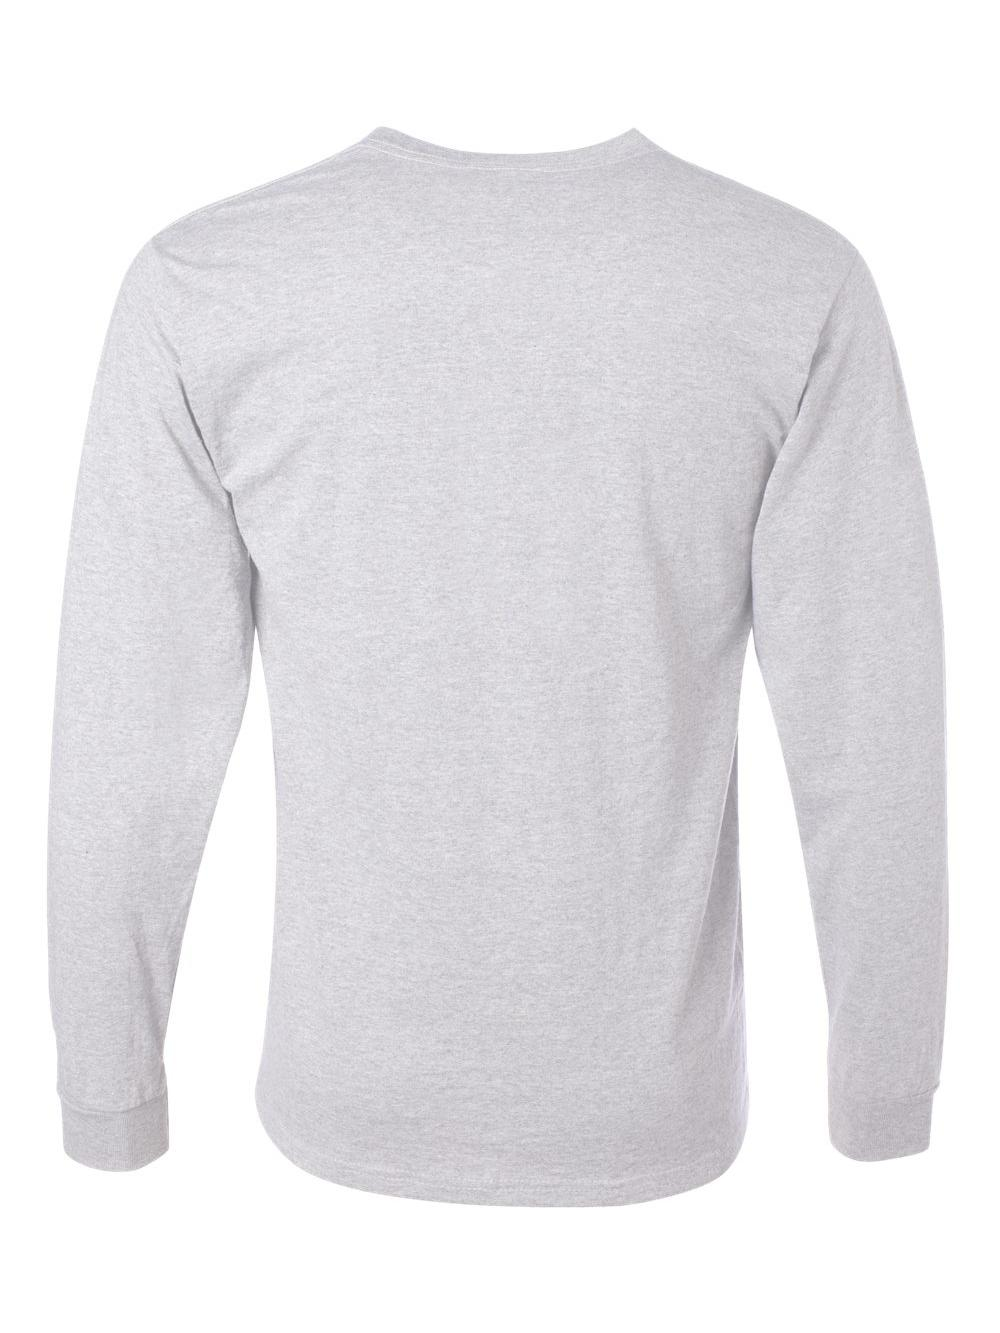 Jerzees-Dri-Power-Long-Sleeve-50-50-T-Shirt-29LSR thumbnail 4